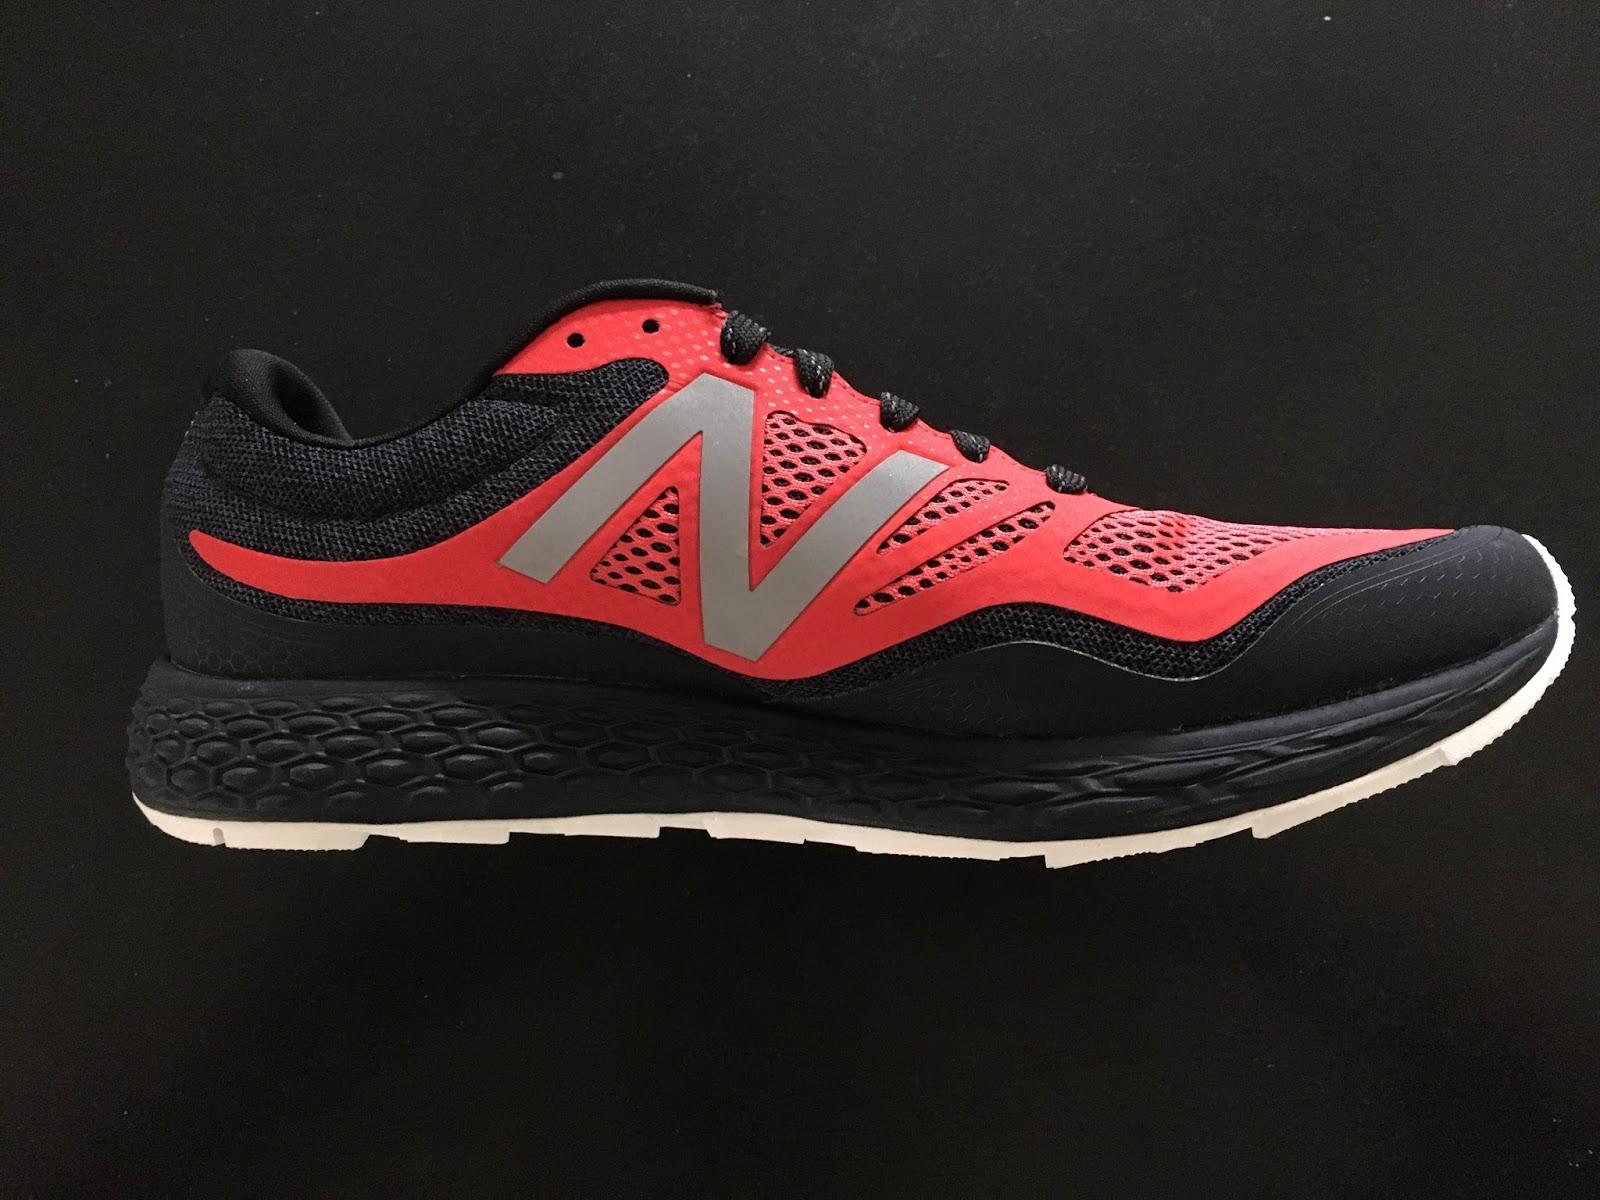 New Balance Zante V Road Running Shoe Review